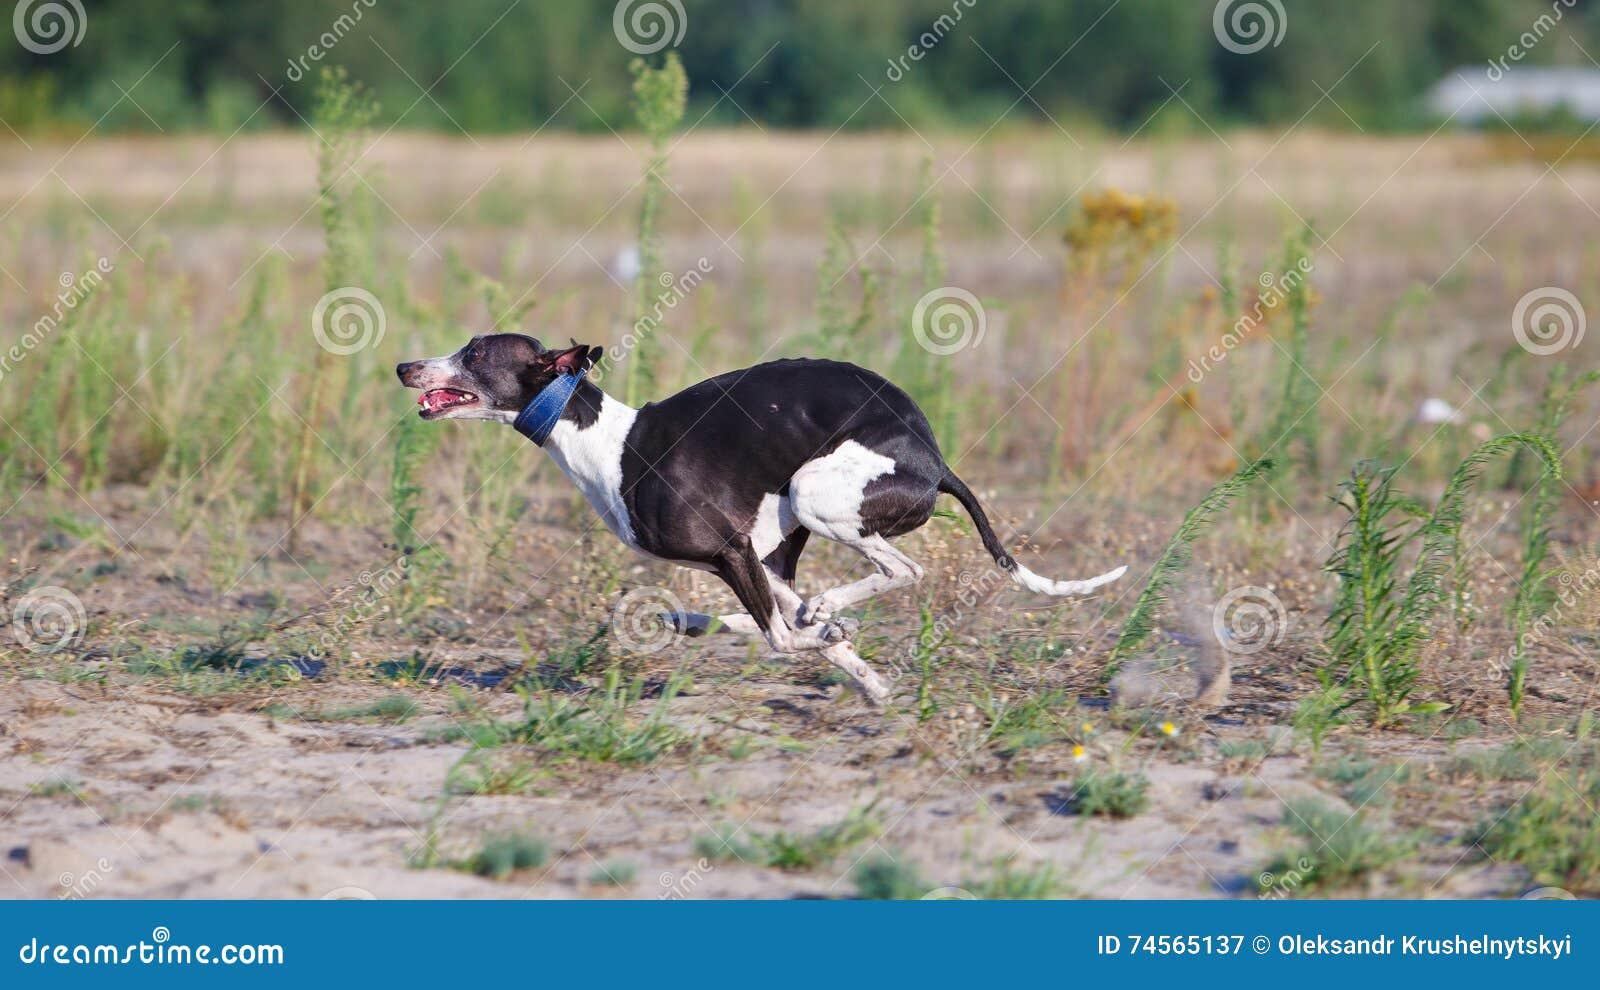 Jaga Whippethundspring i fältet